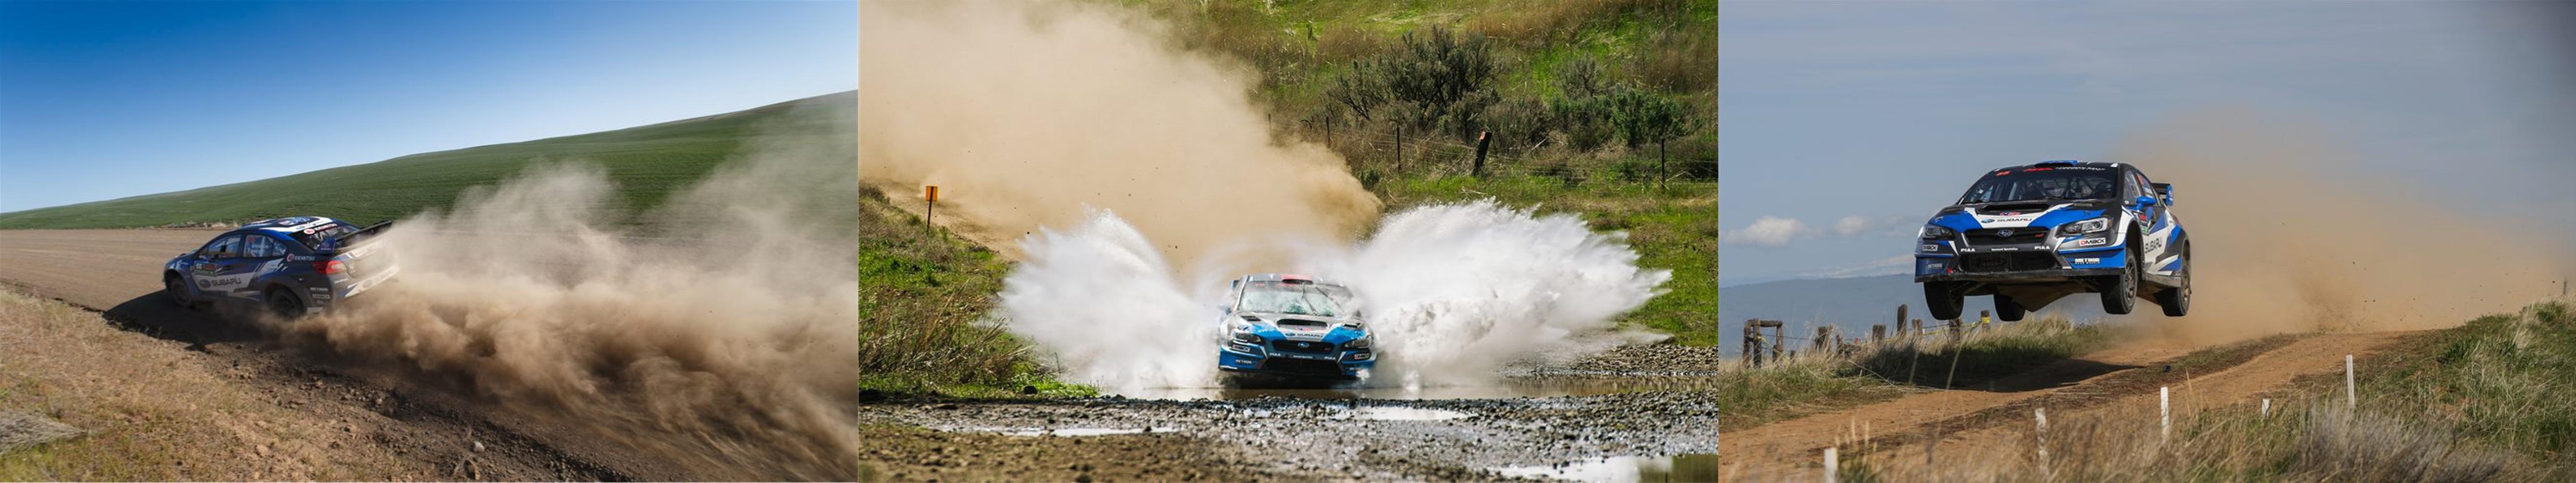 5760x1080 px, audi r8, audi r8 spyder, car, triple screen 5760x1080,1067898. Tribute To Subaru Rally Team S First Win For Ara 2018 5760 X 1080 Part 2 Subaru Rally Finance Subaru